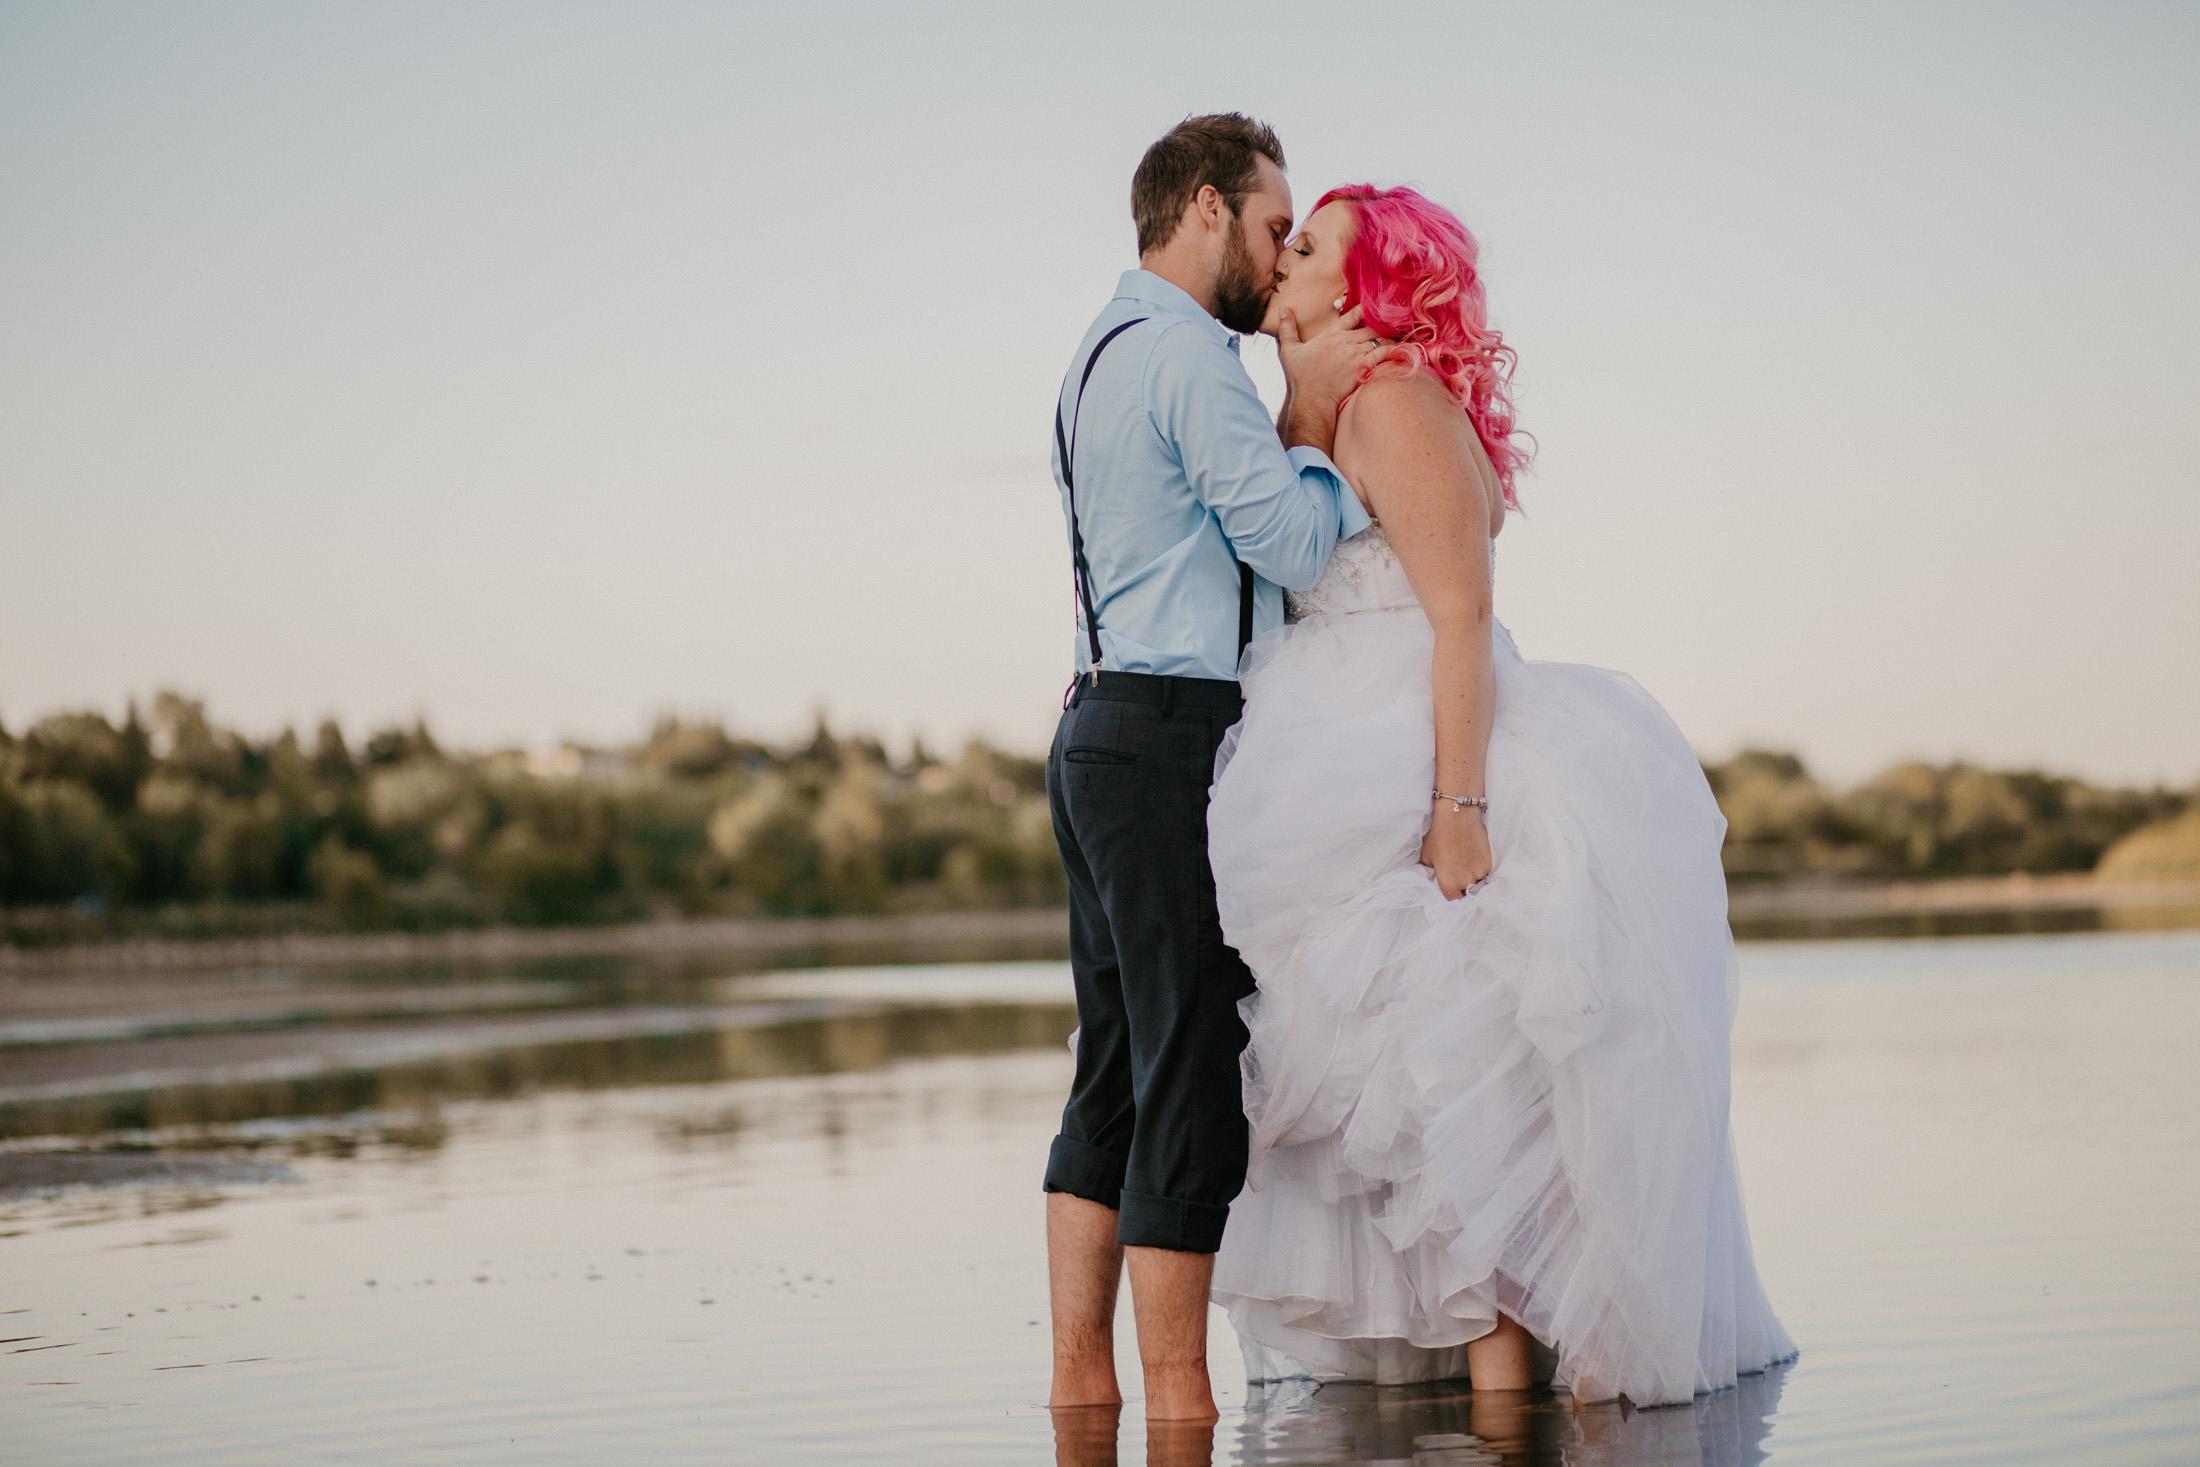 EnsoulEndearmentImagery-WeddingAnniversary-SaskatoonWeddingPhotographer-8478.jpg